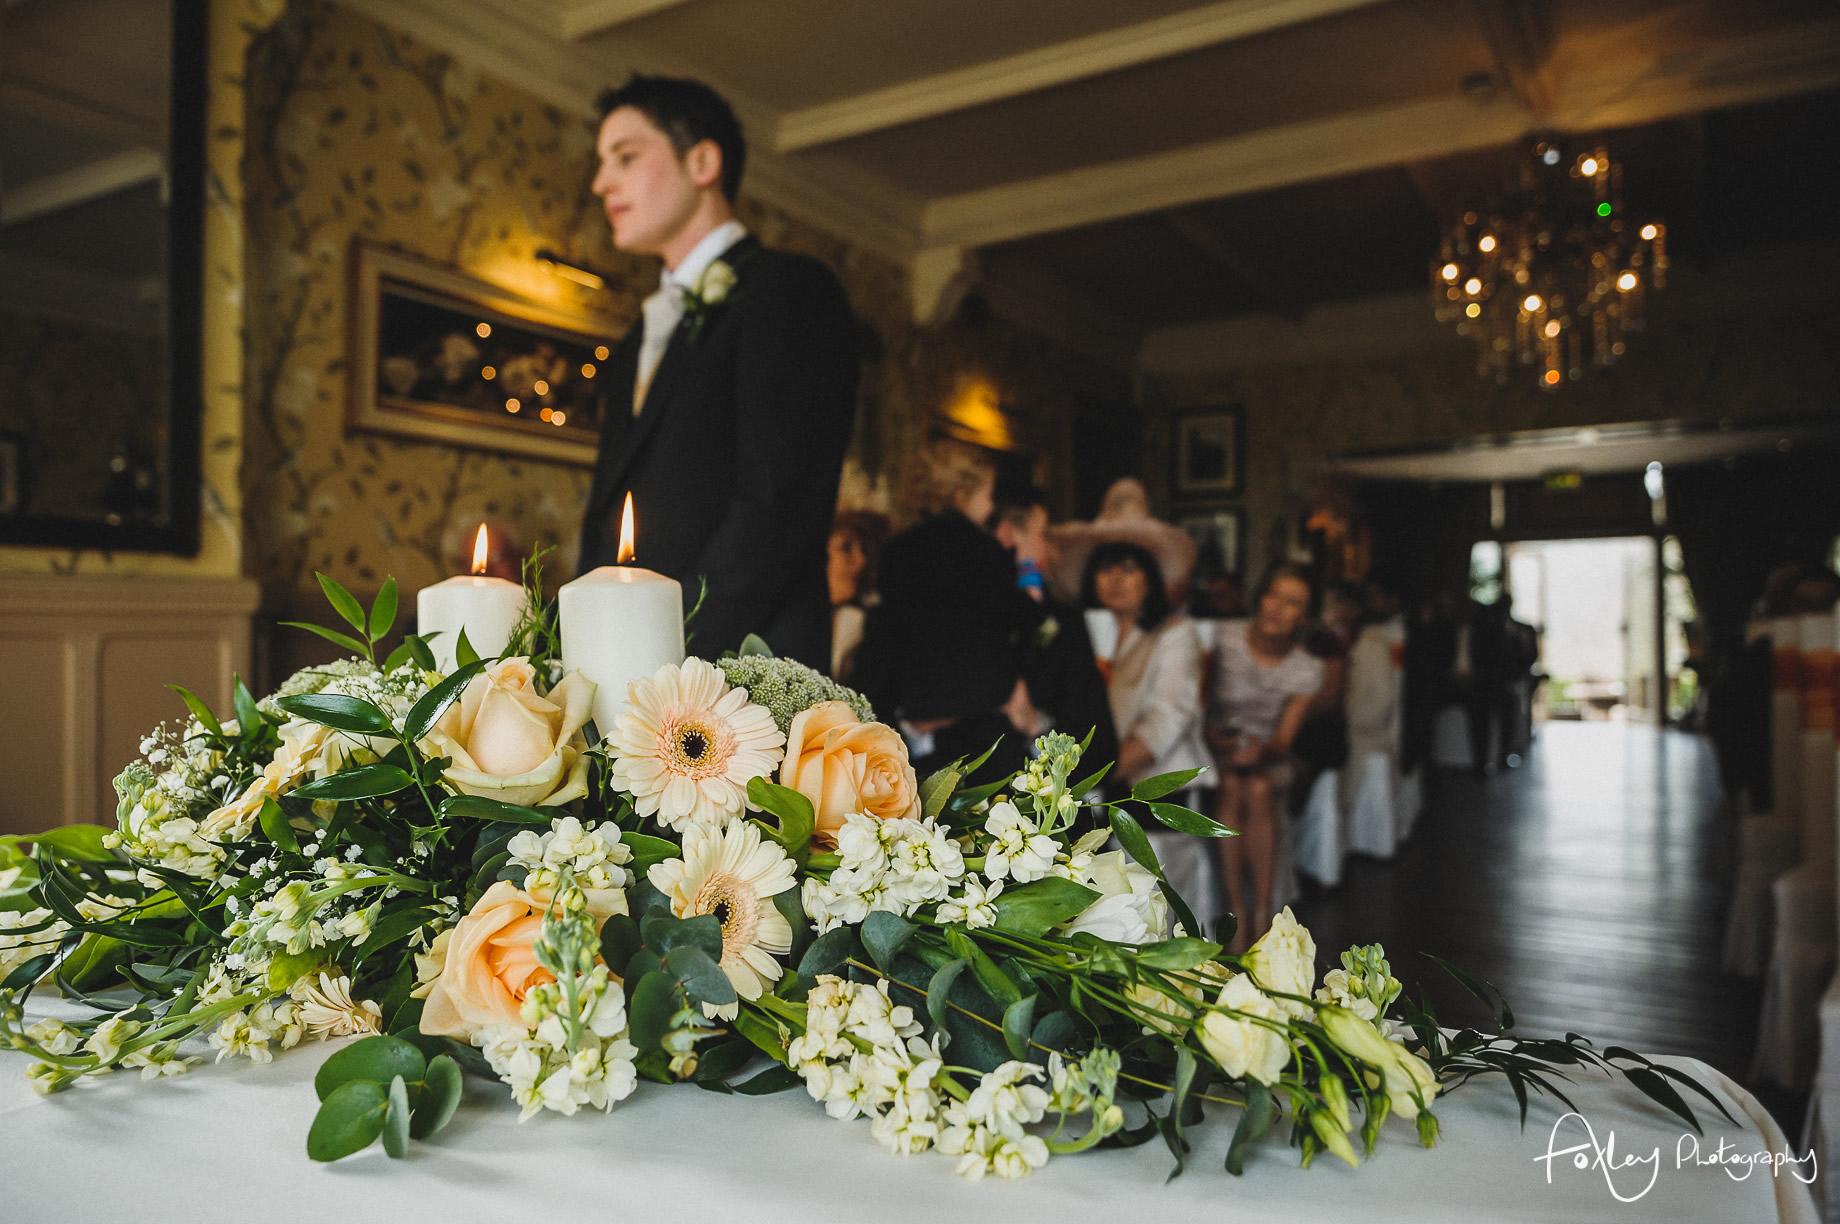 Gemma and Lewis' Wedding at Mitton Hall 068